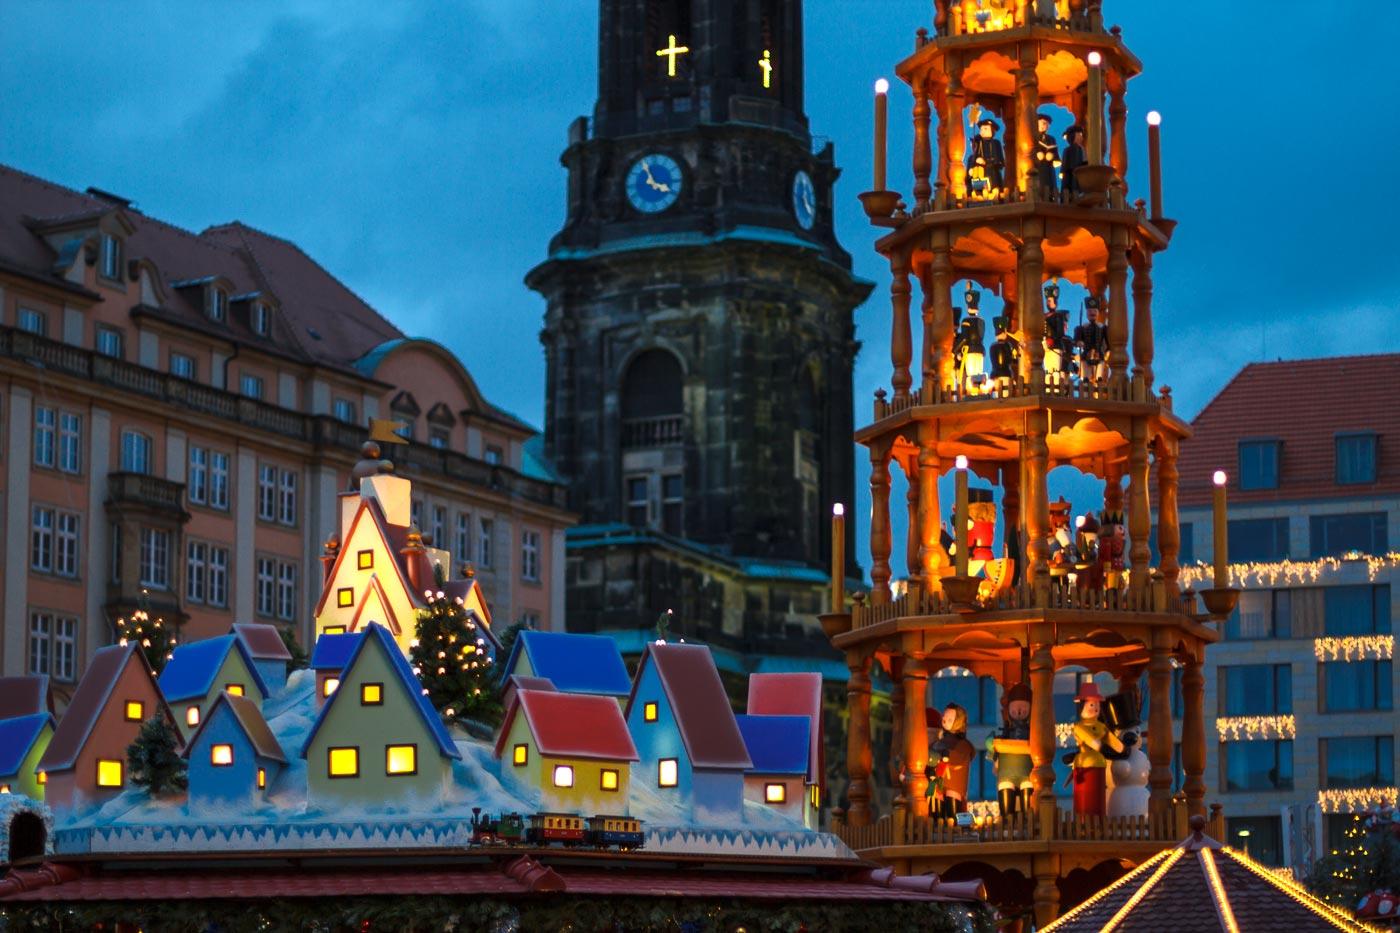 Адвентная ярмарка в Дрездене, Германия, 2011 год